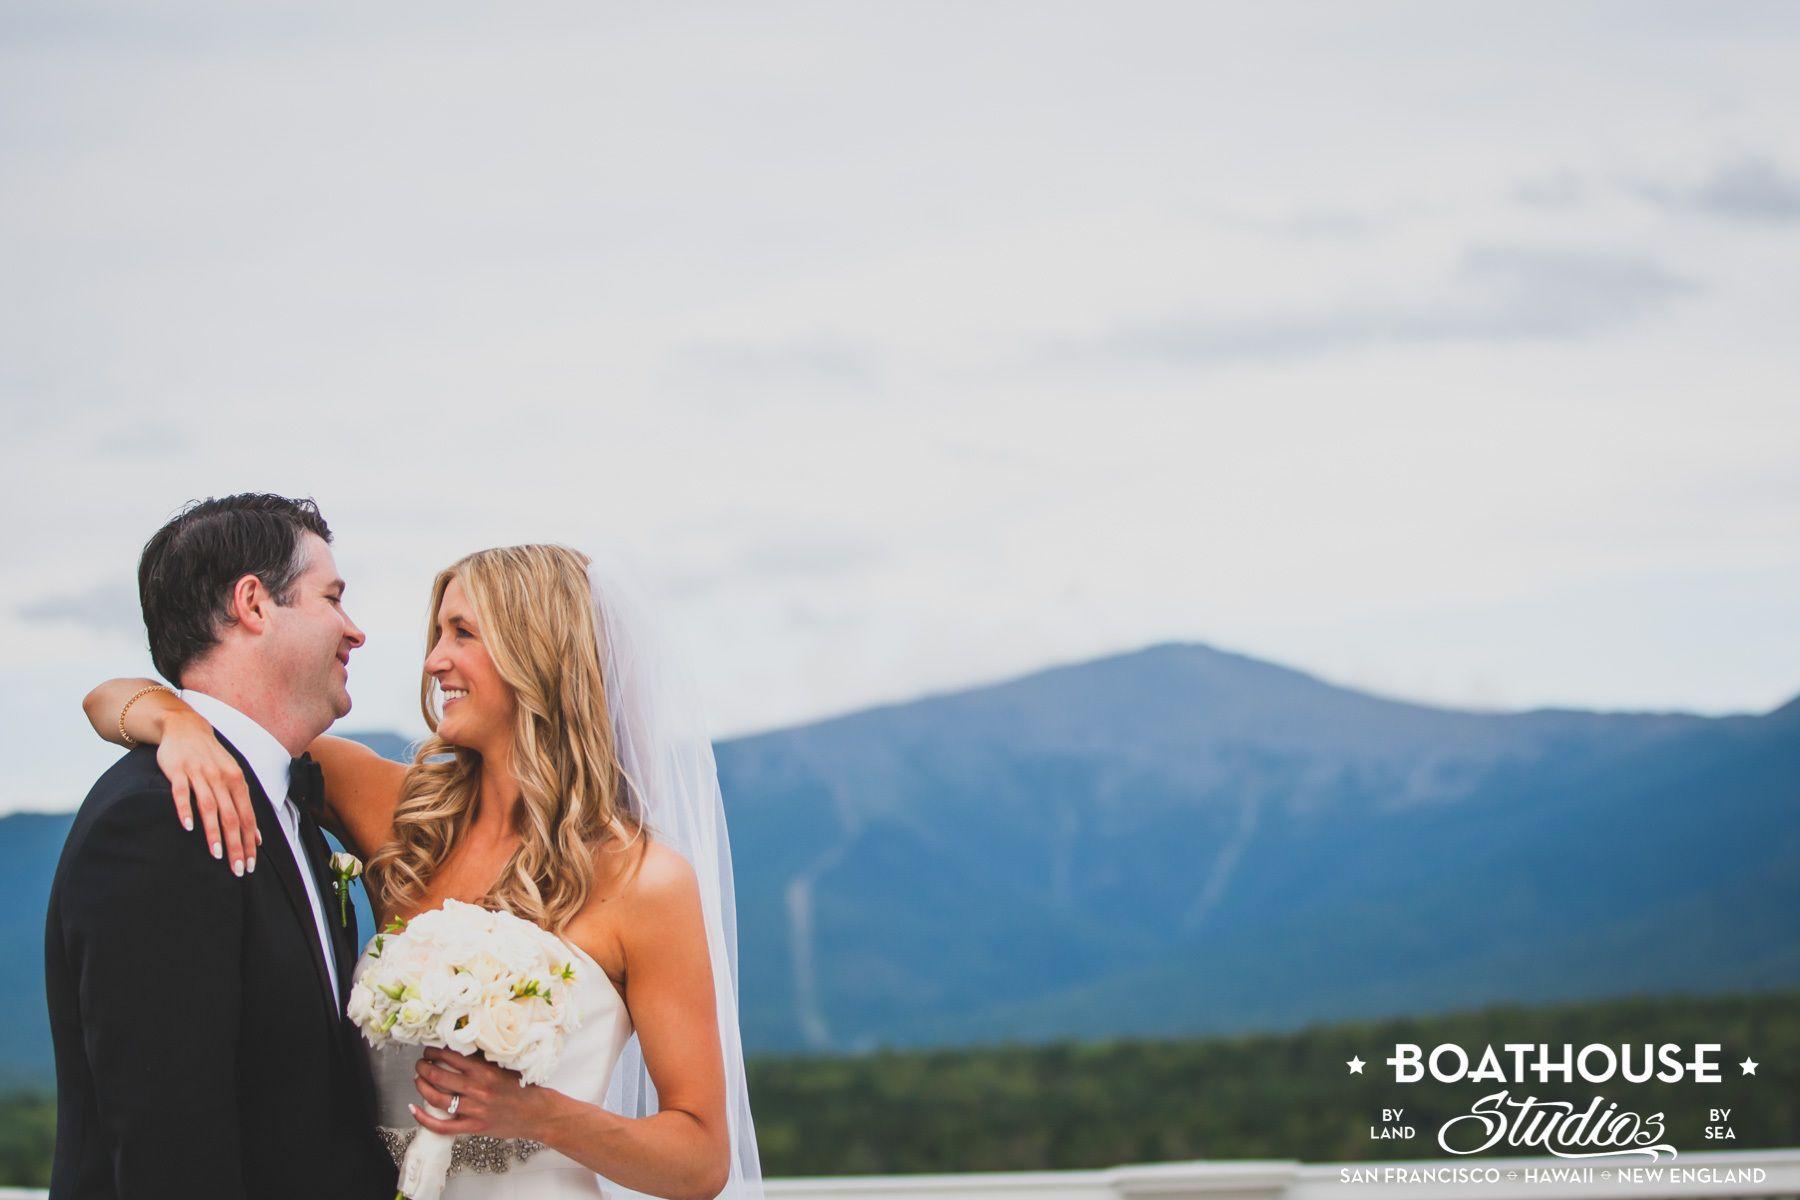 A Mount Washington Hotel Wedding